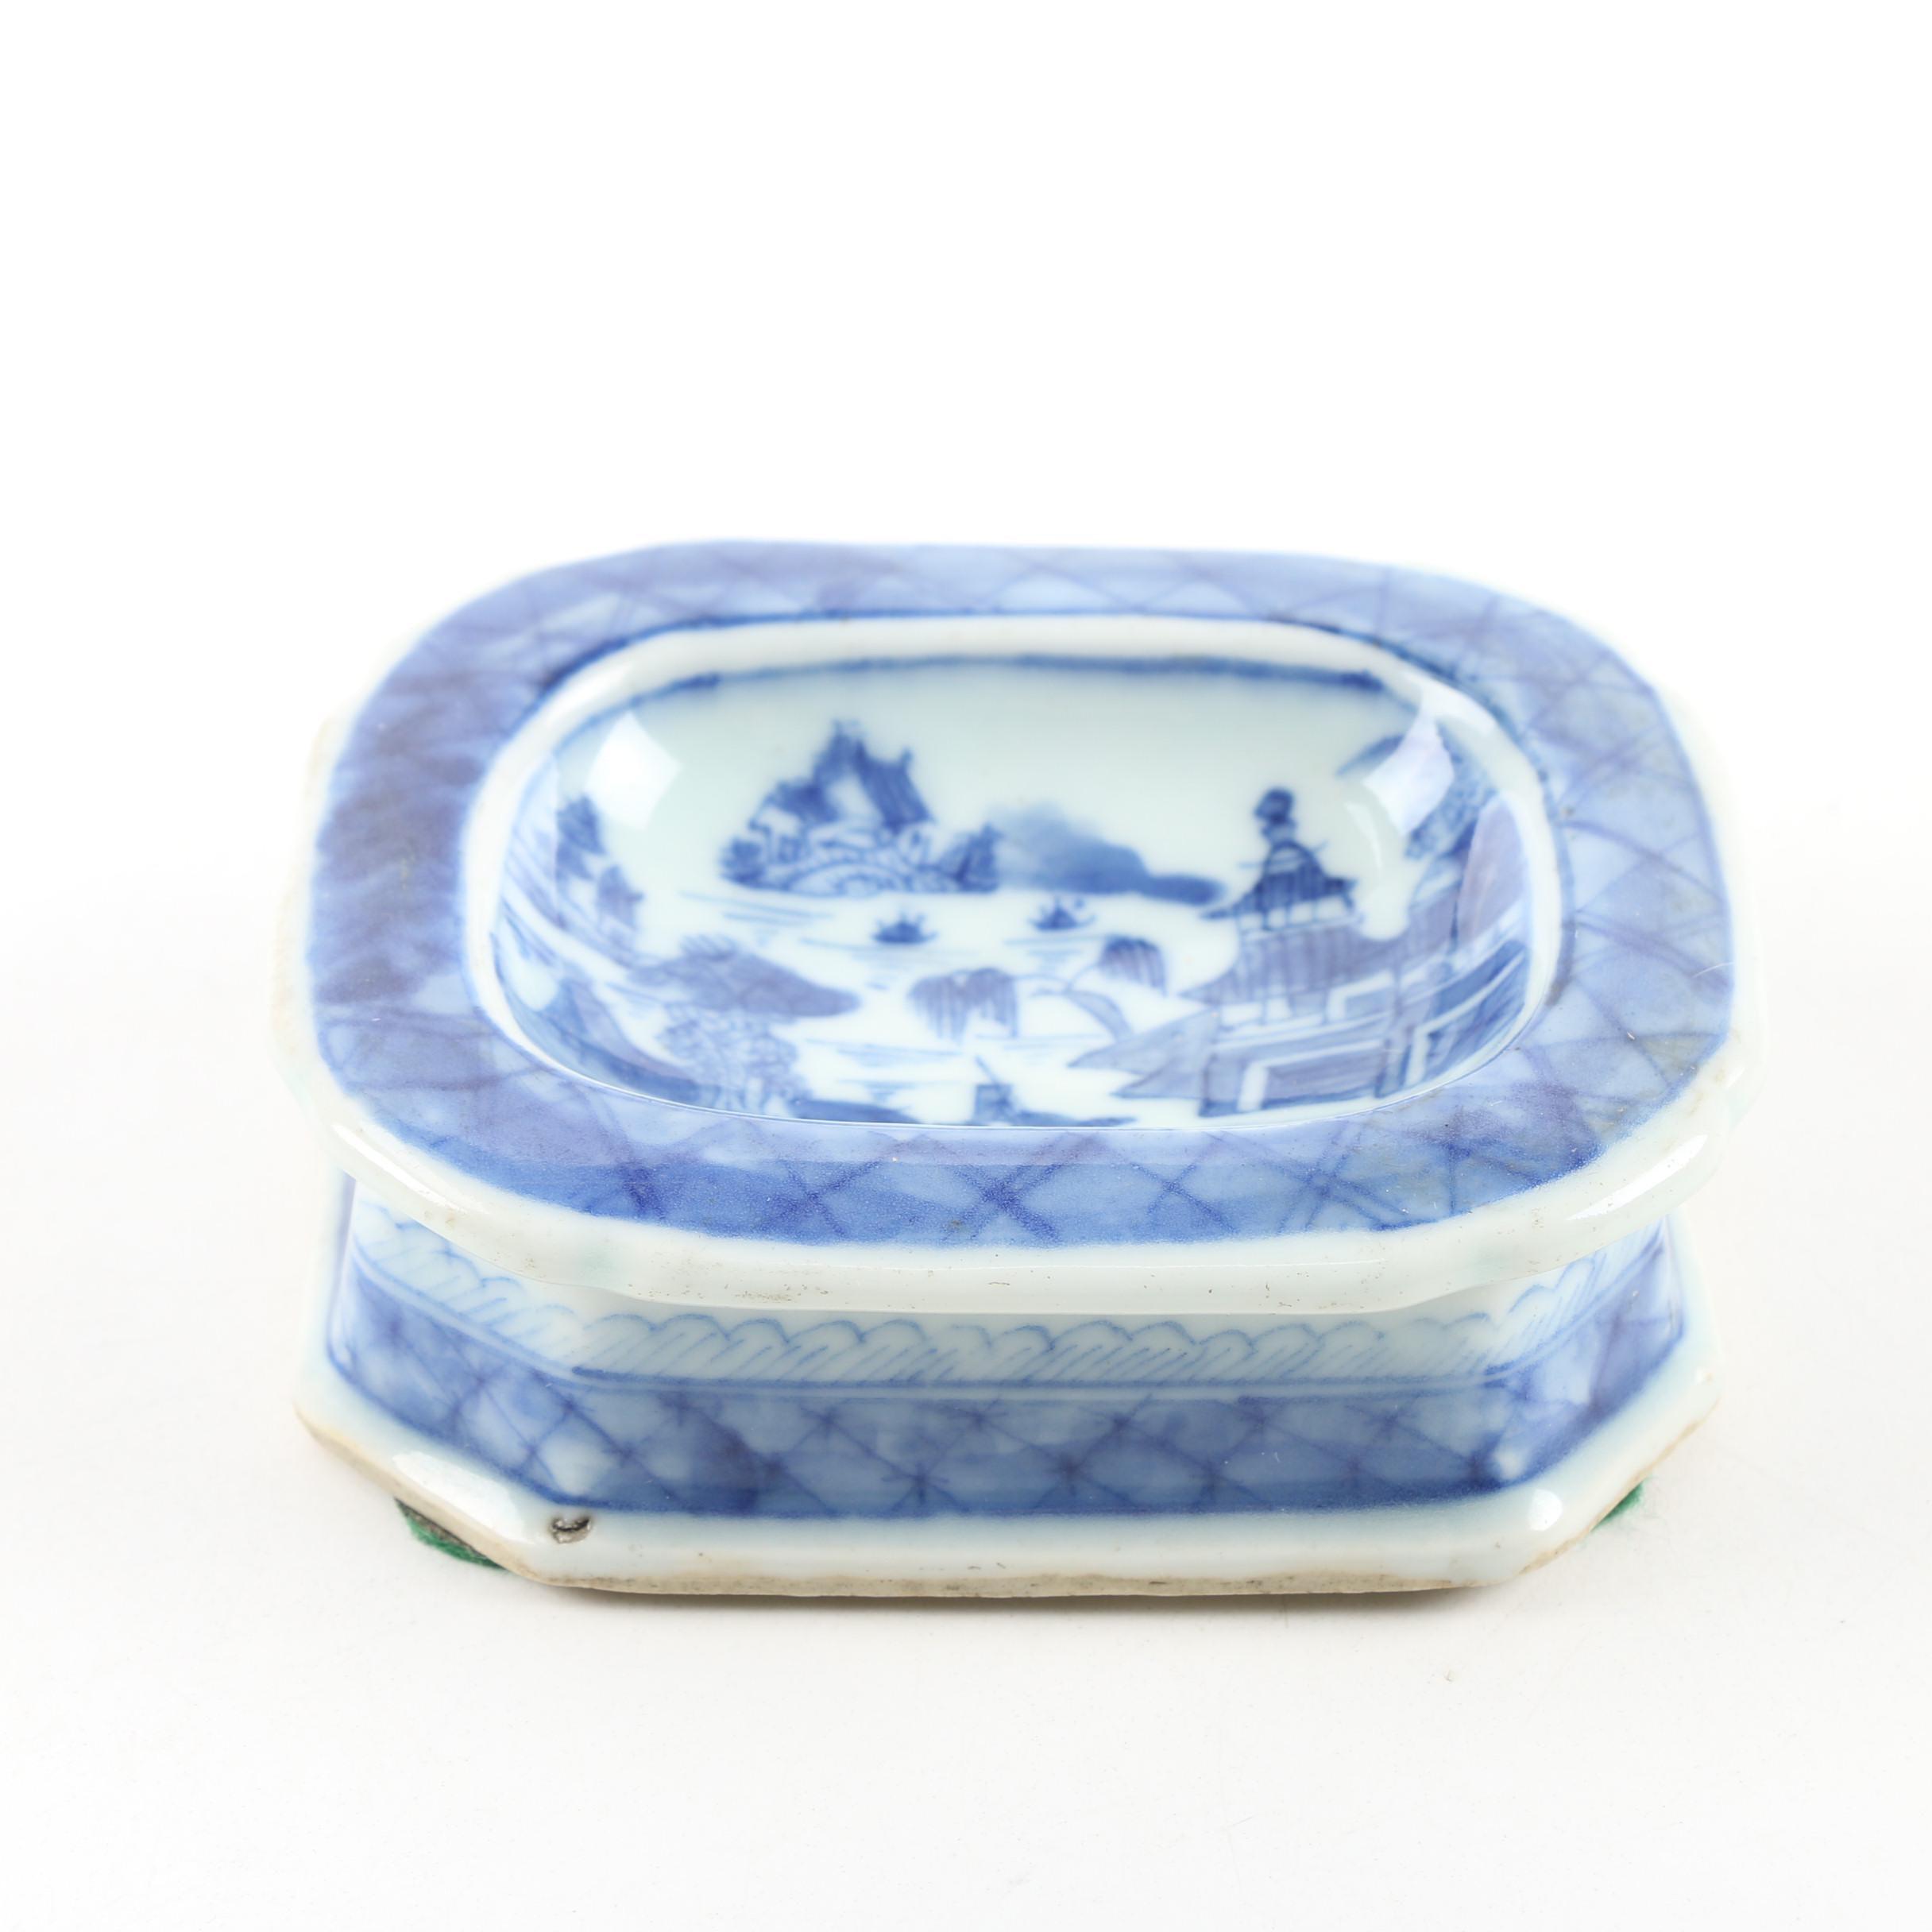 Chinese Export Canton Porcelain Salt Cellar, 19th Century